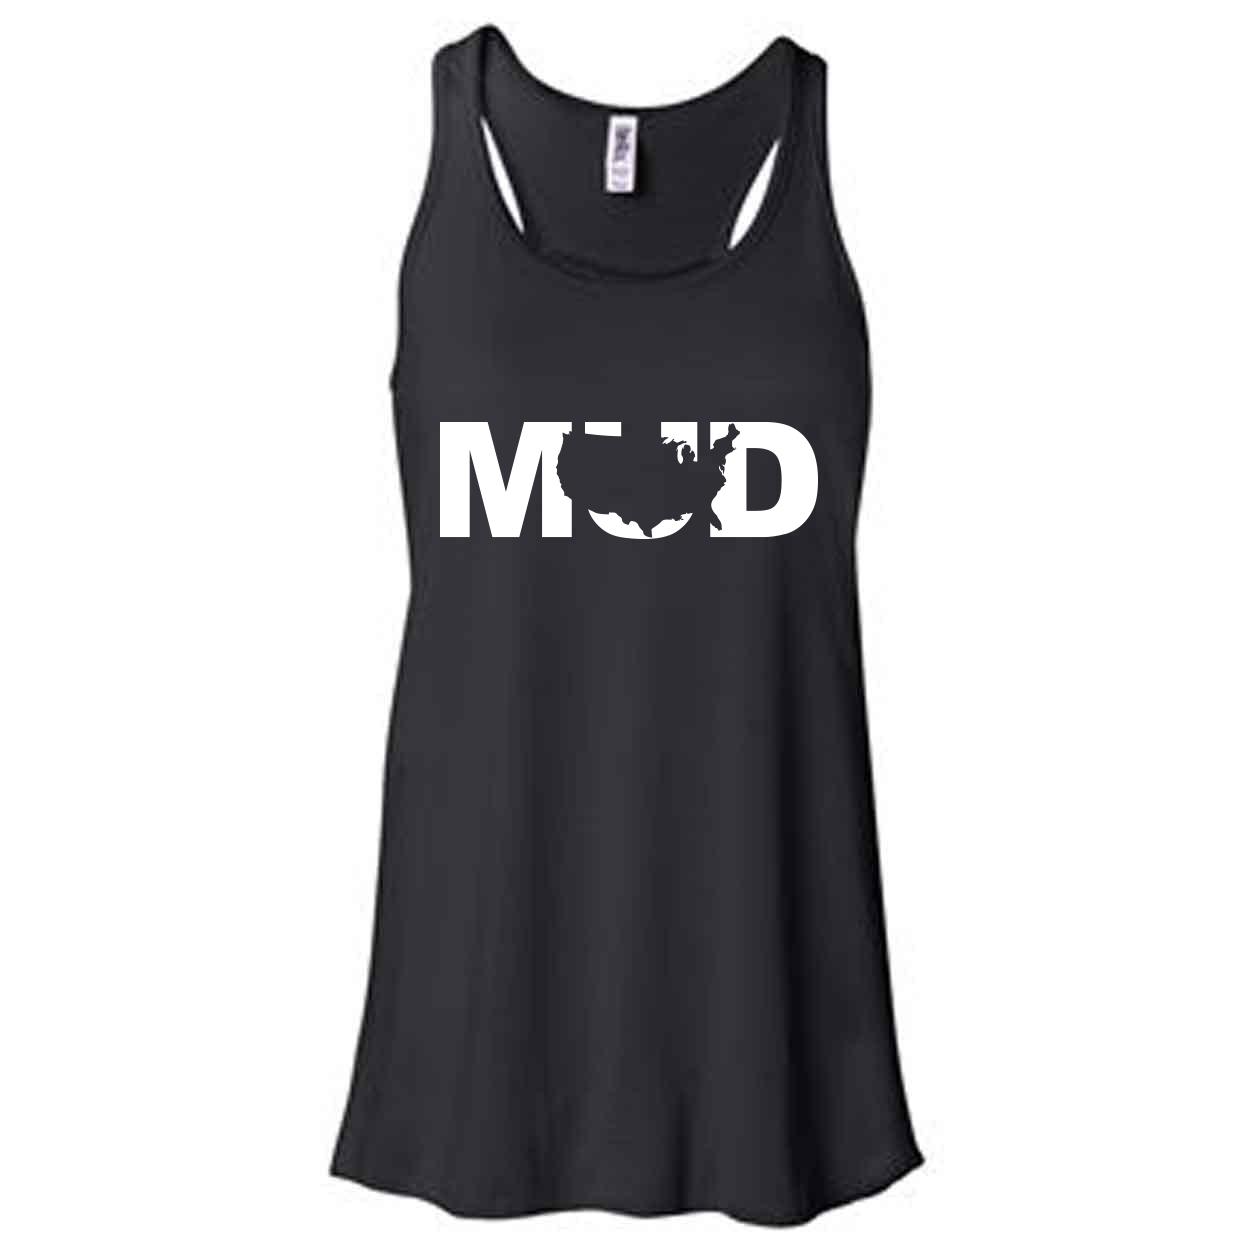 Mud United States Classic Women's Flowy Racerback Tank Top Black (White Logo)